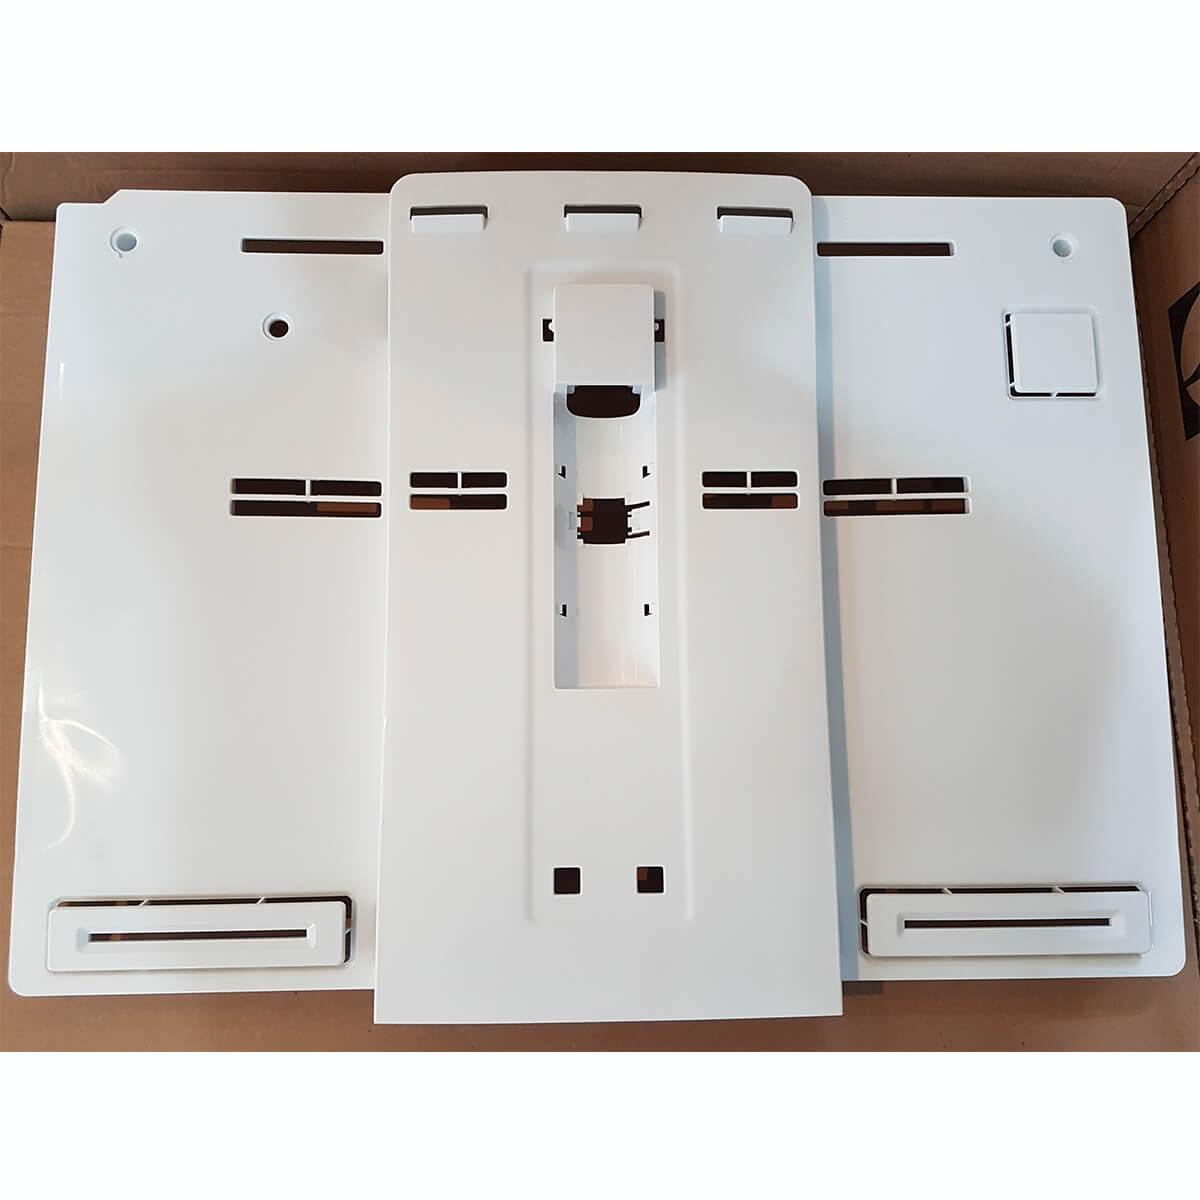 Tampa Frontal Evaporador Refrigerador Frost Free Electrolux DF80 DF80X DI80X DT80X DF82 DF82X - A00411101